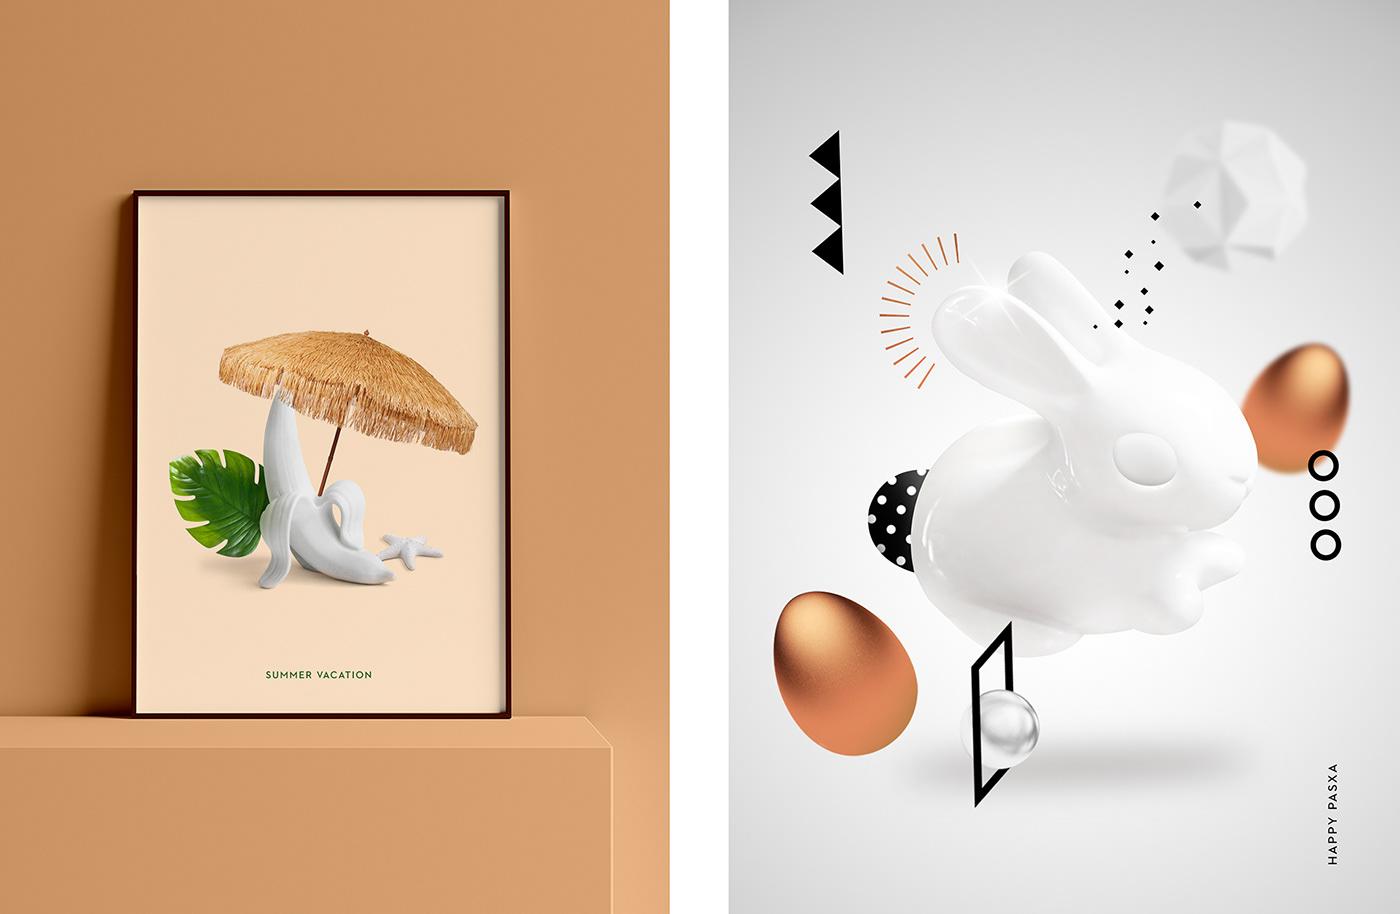 artworks cards Christmas Easter geometric graphic design  greeting holidays ILLUSTRATION  xmas